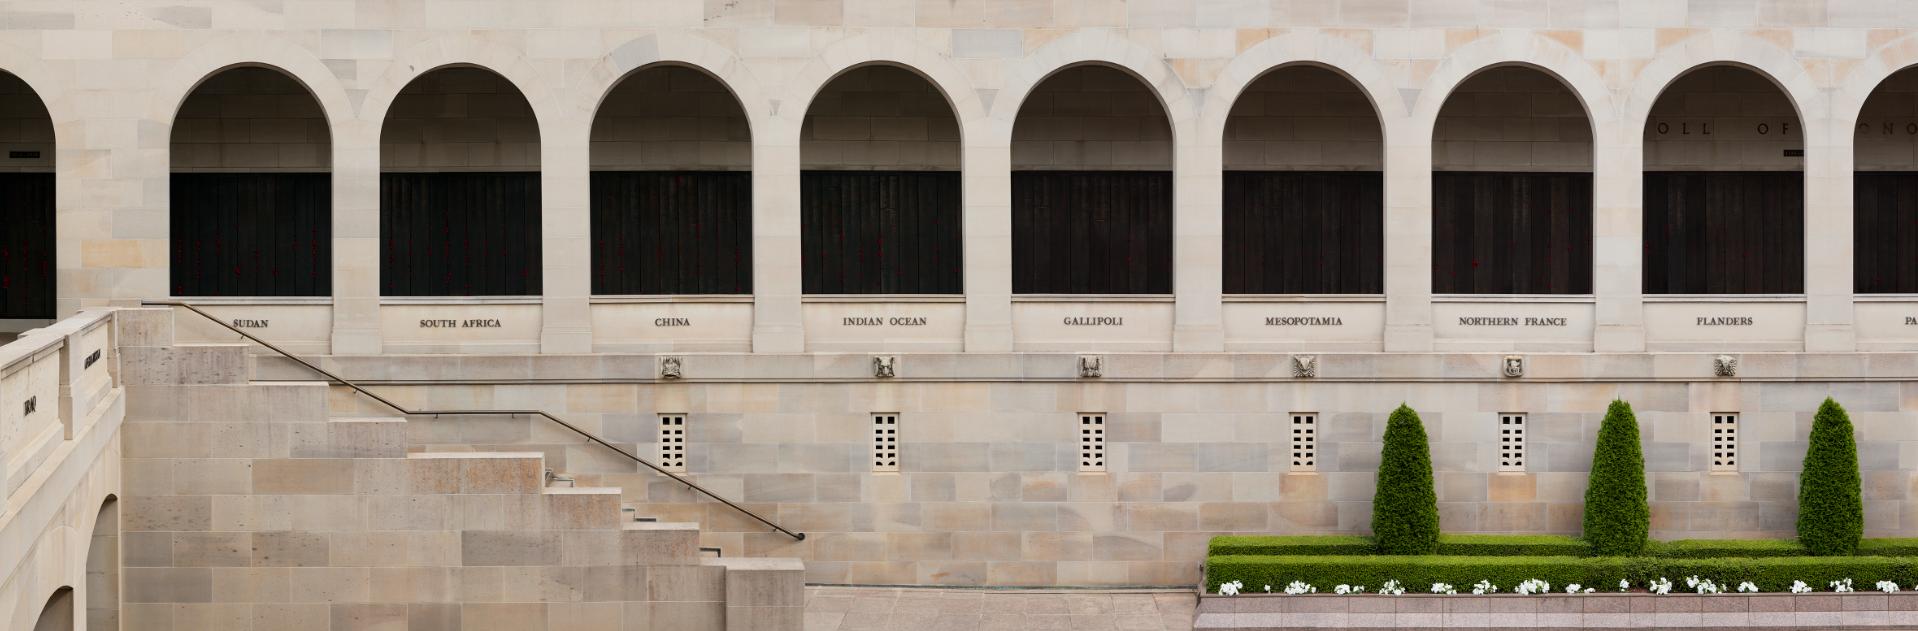 Australian War Memorial Canberra - Wondabyne 3.png